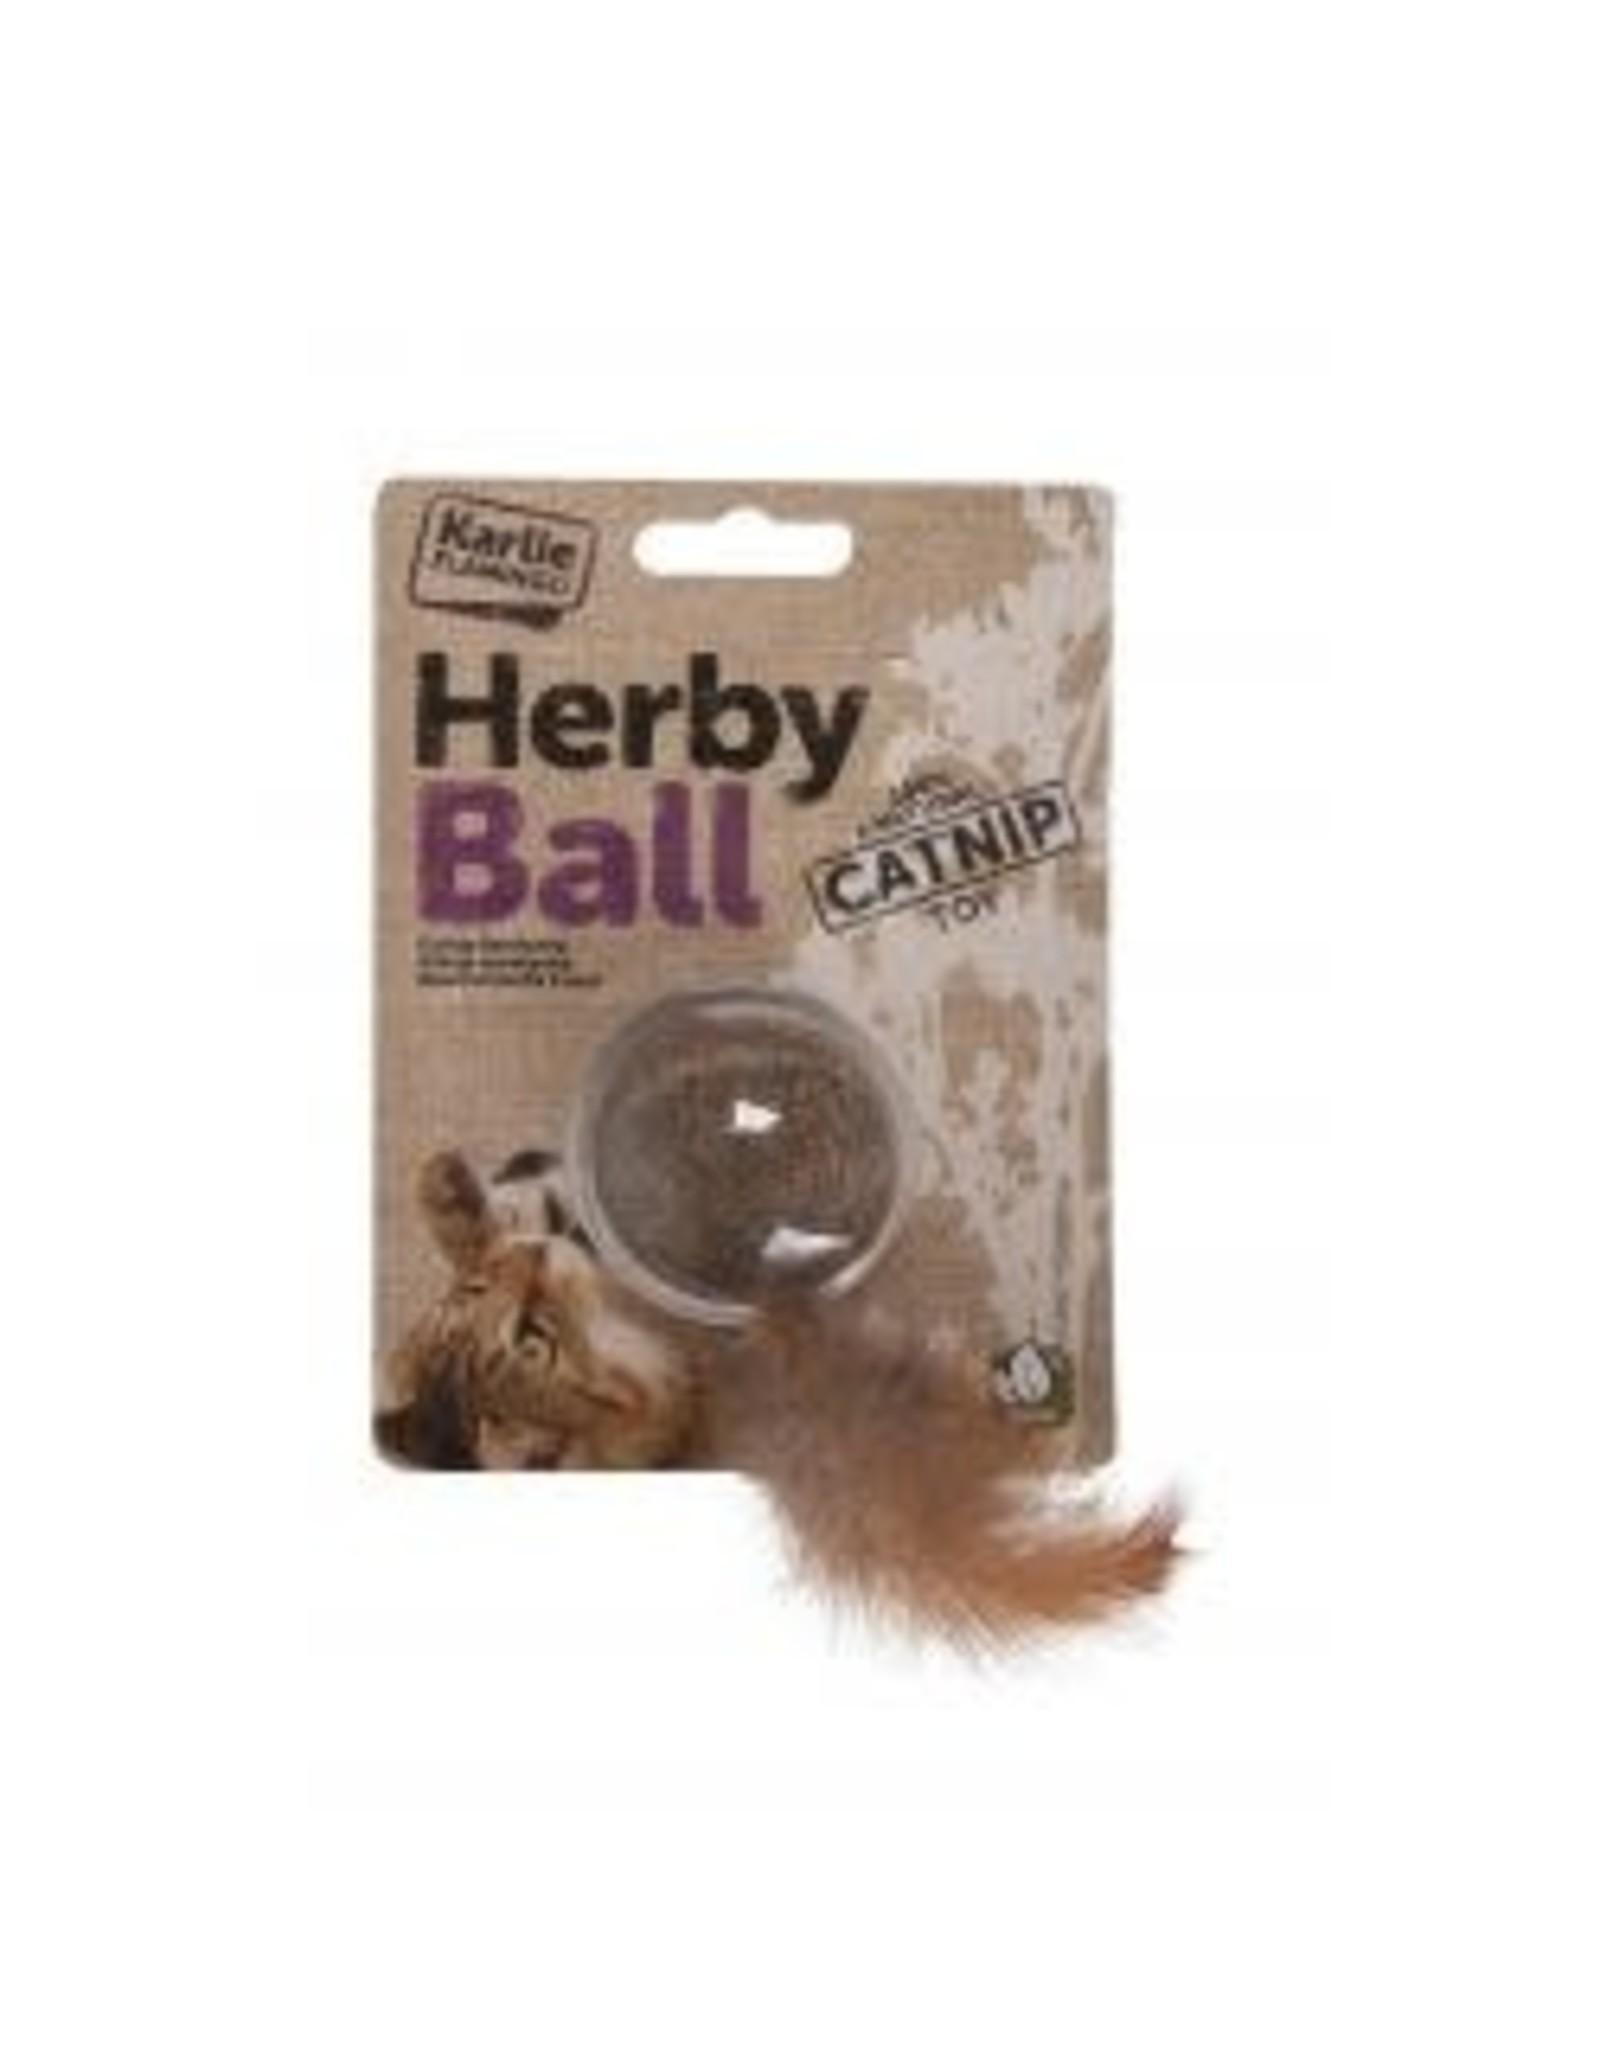 Karlie Herby Ball Catnip Toy